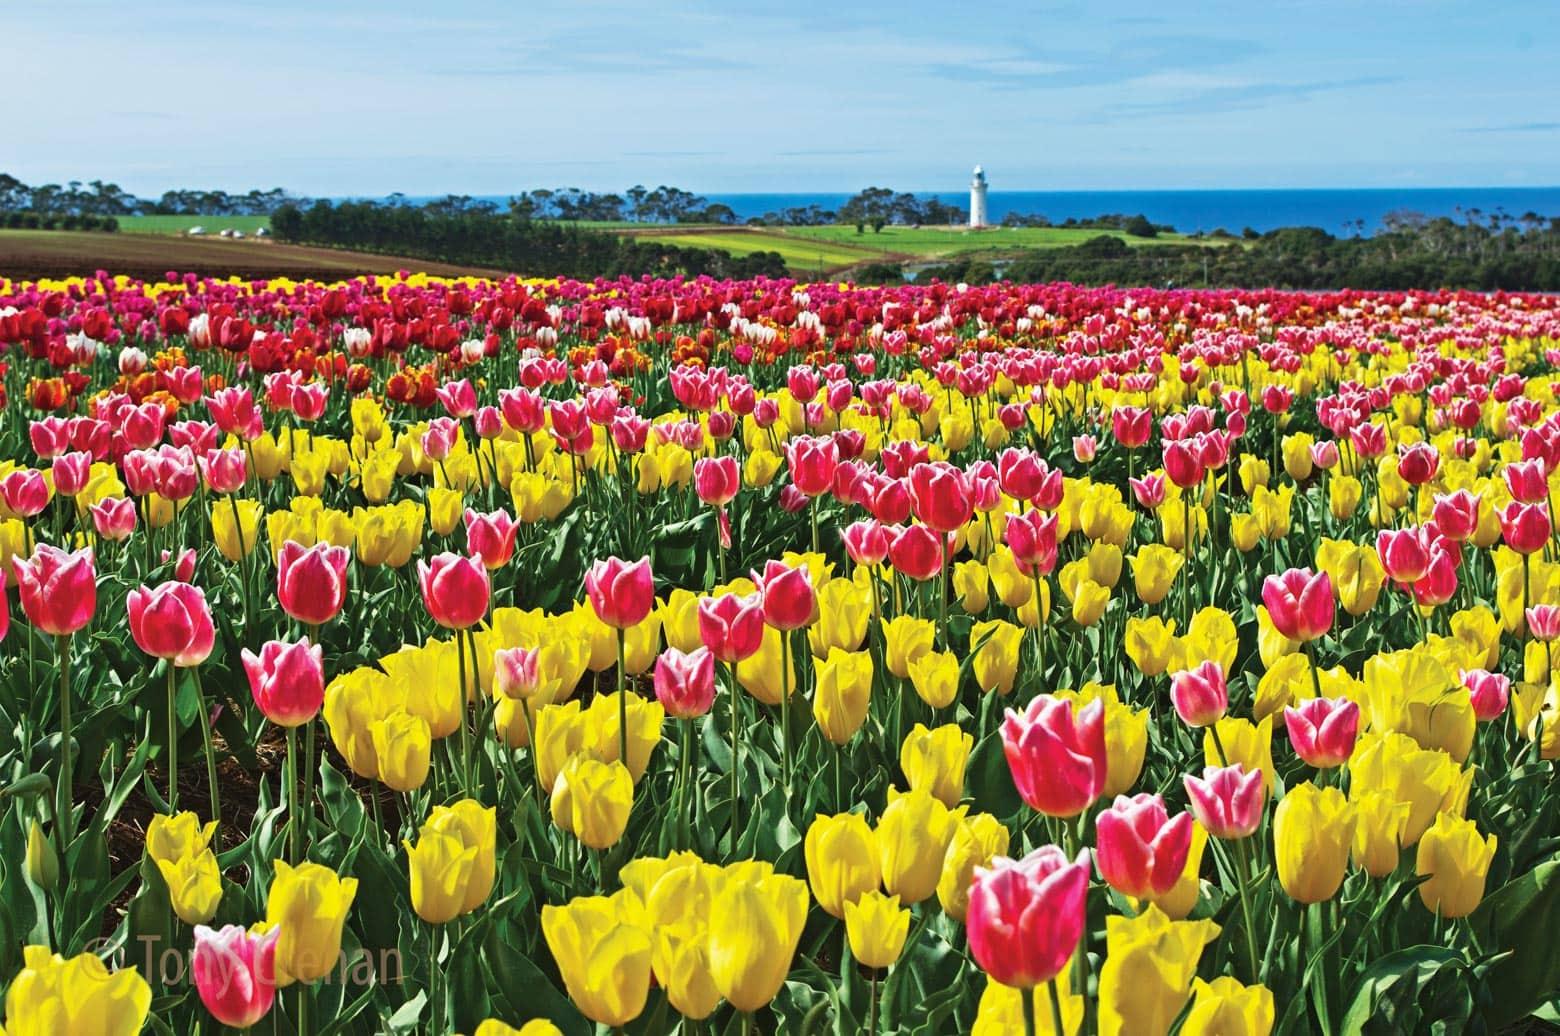 Table Cape Tulip Farm on your Lap of Tasmania road trip